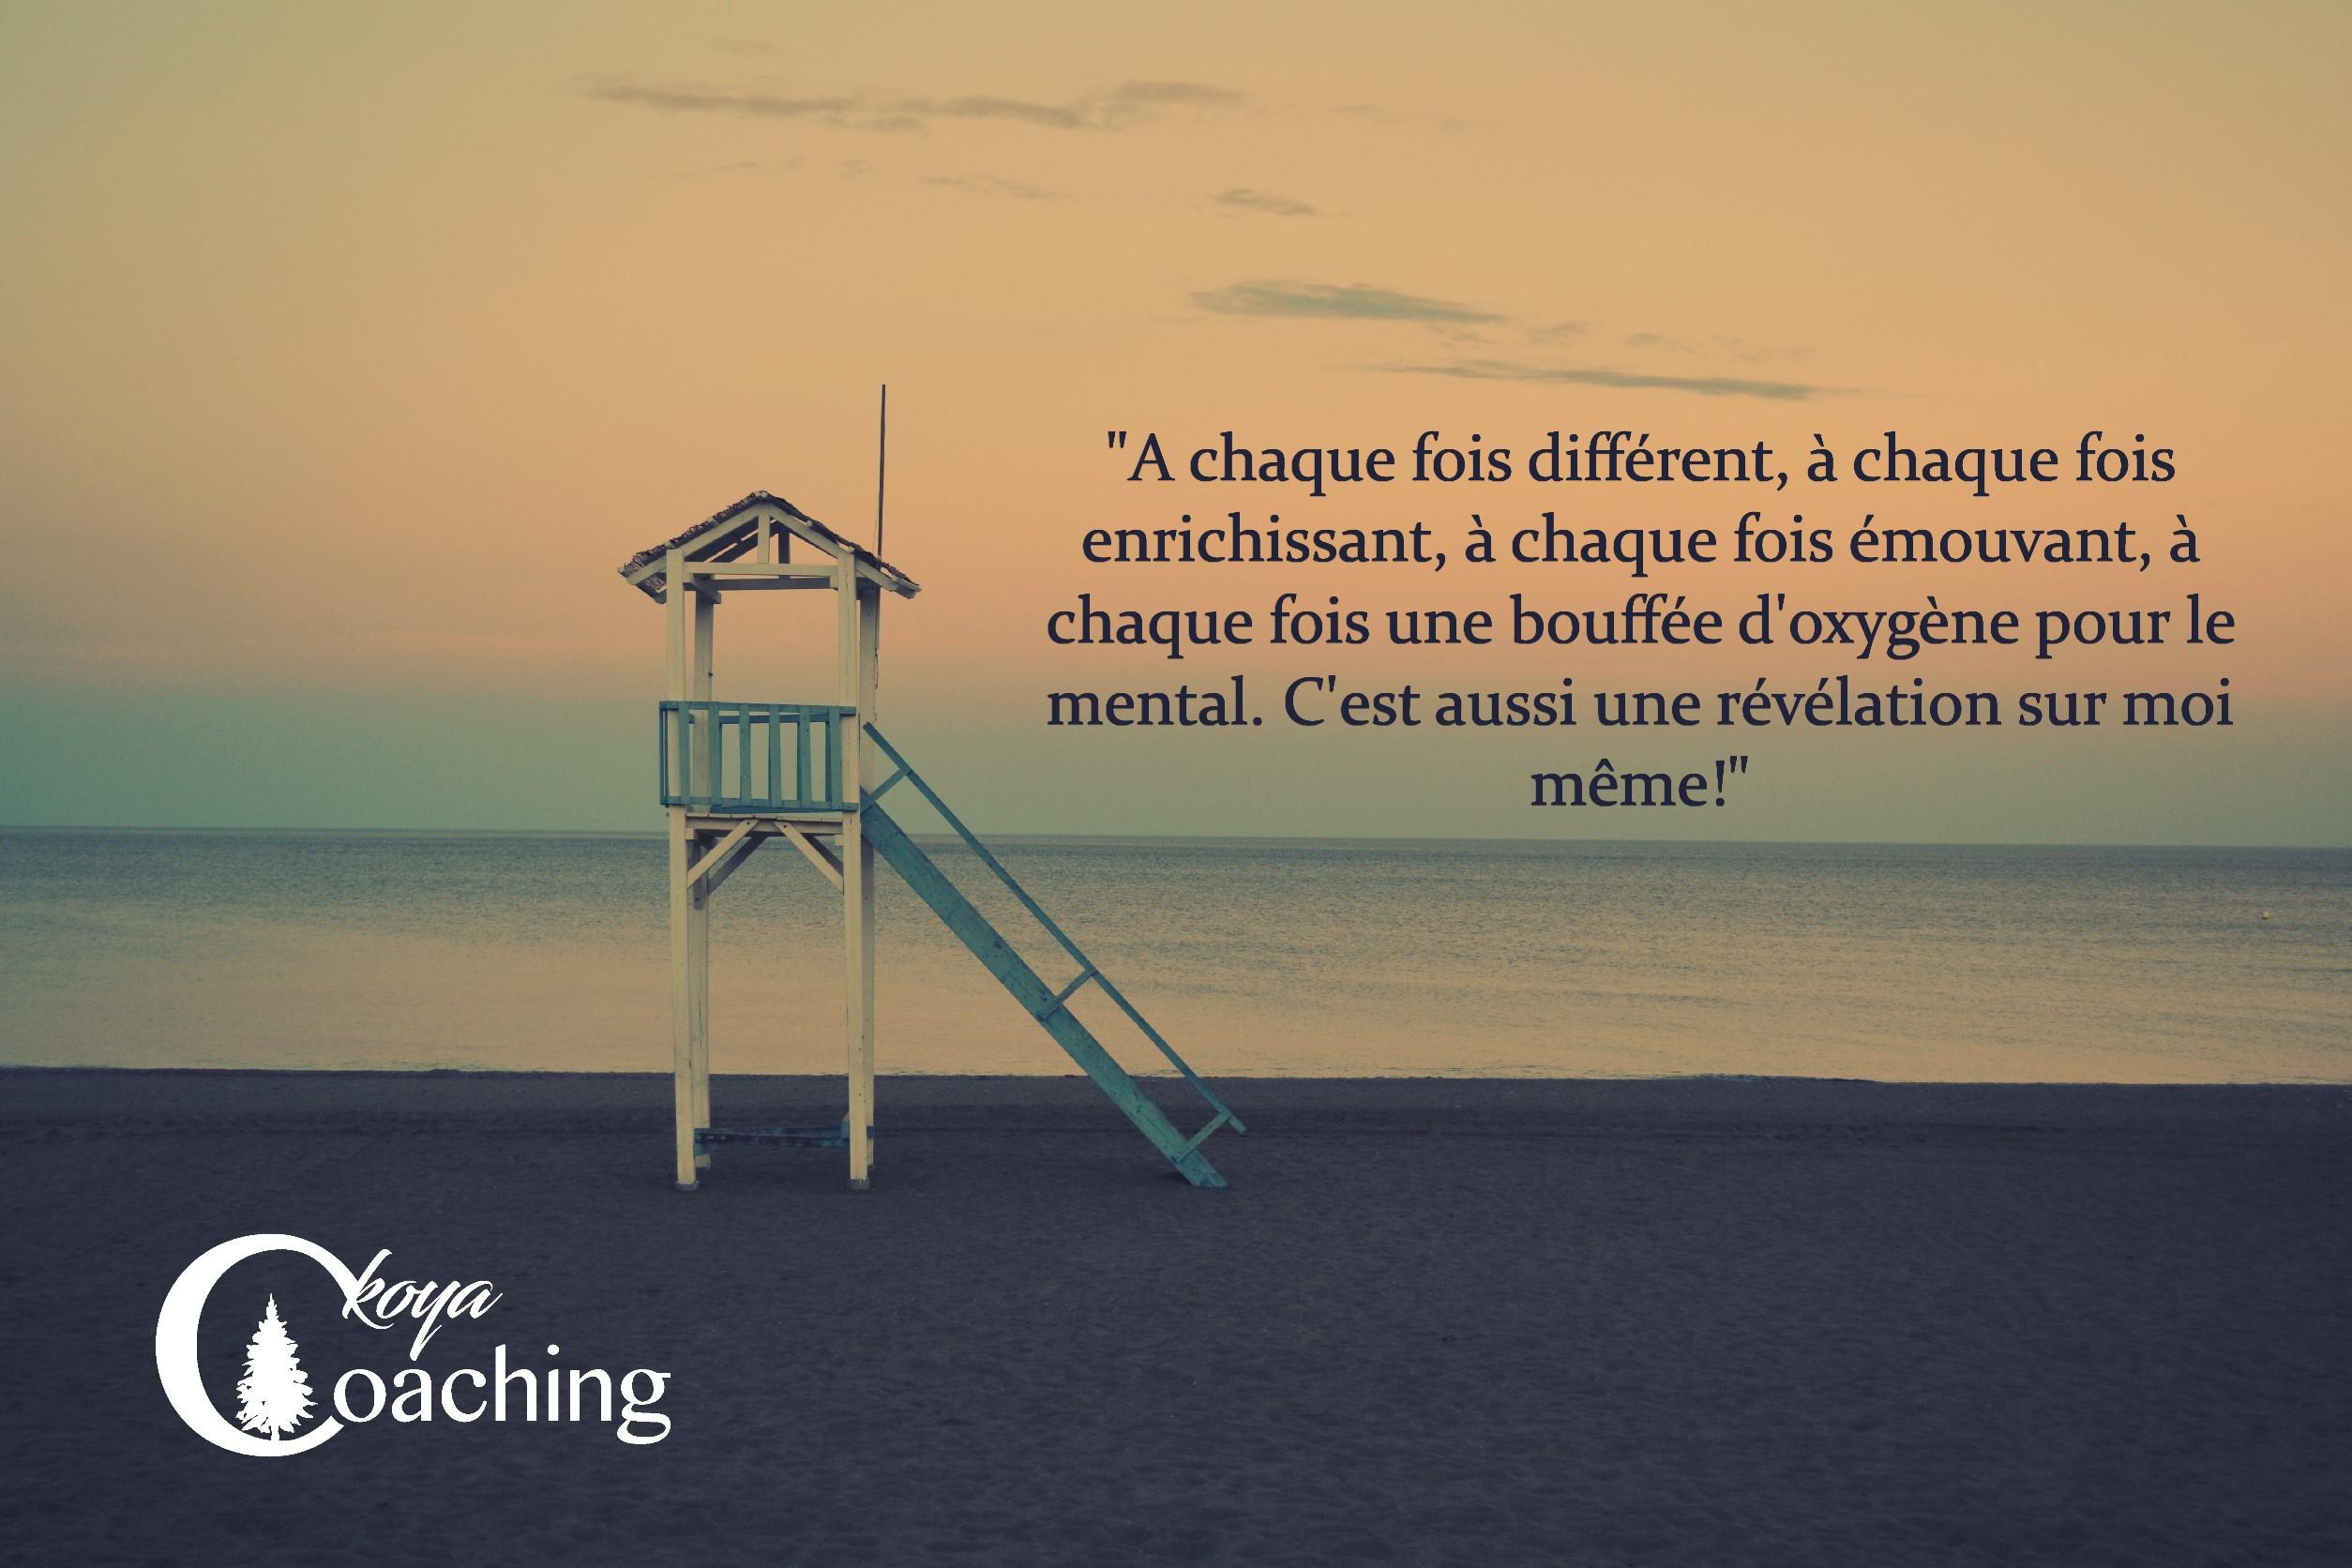 Mon Parcours Ariane C'Koya Coaching fre-sonneveld-1771-unsplash